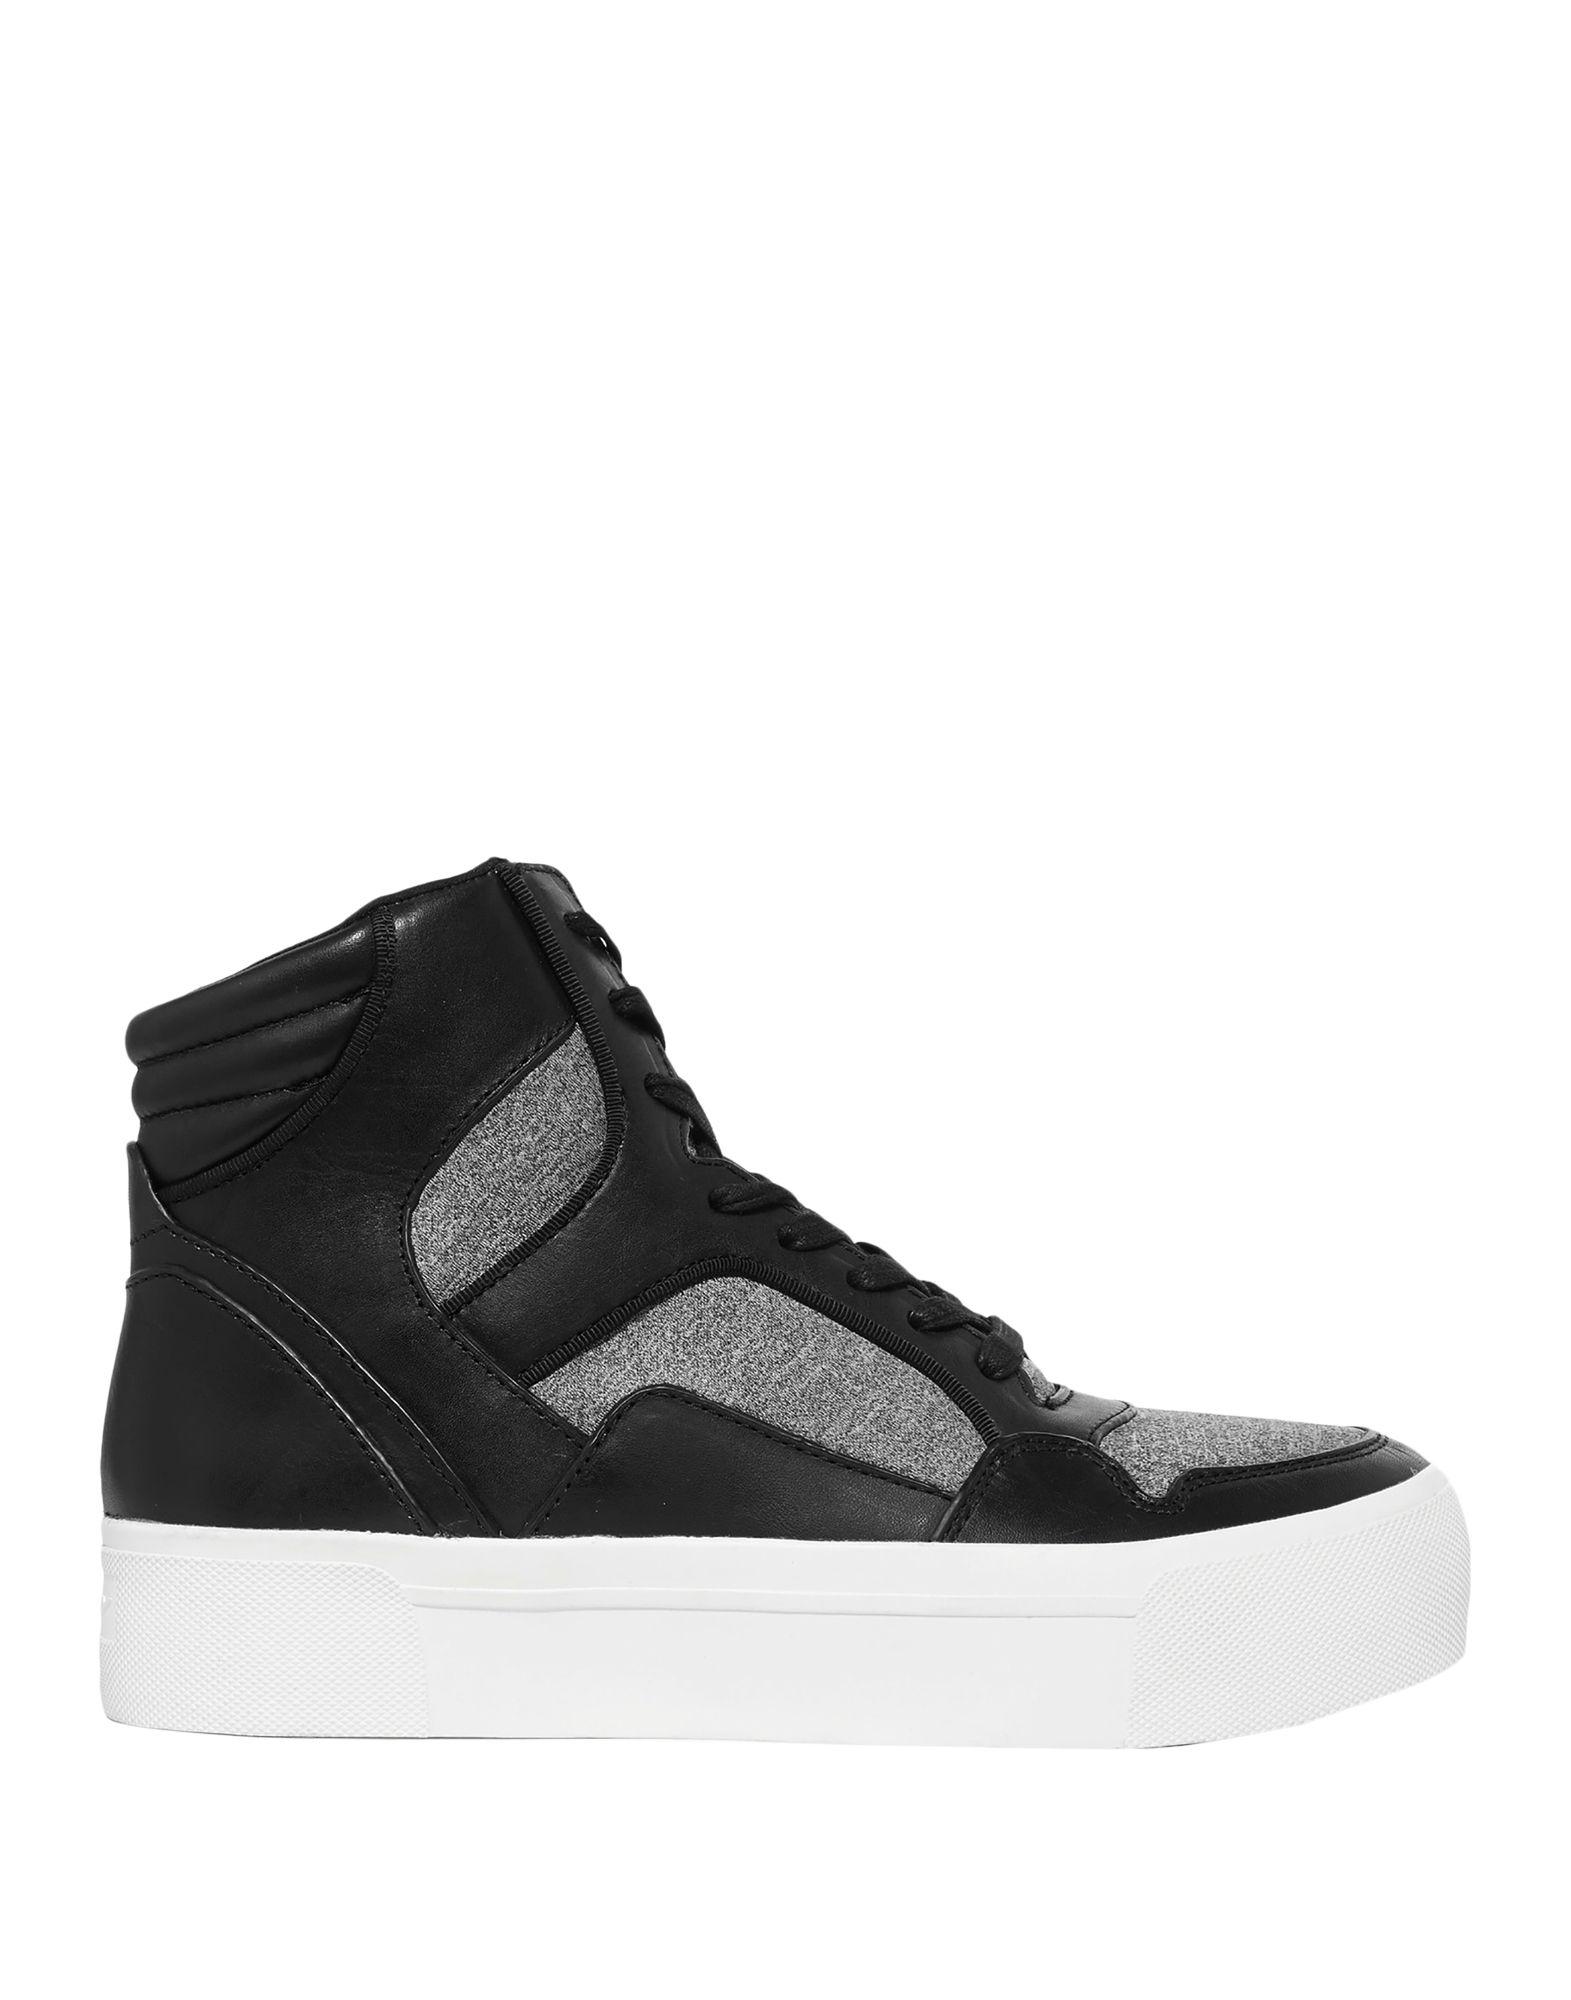 5c02bc475f DKNY ΠΑΠΟΥΤΣΙΑ Χαμηλά sneakers